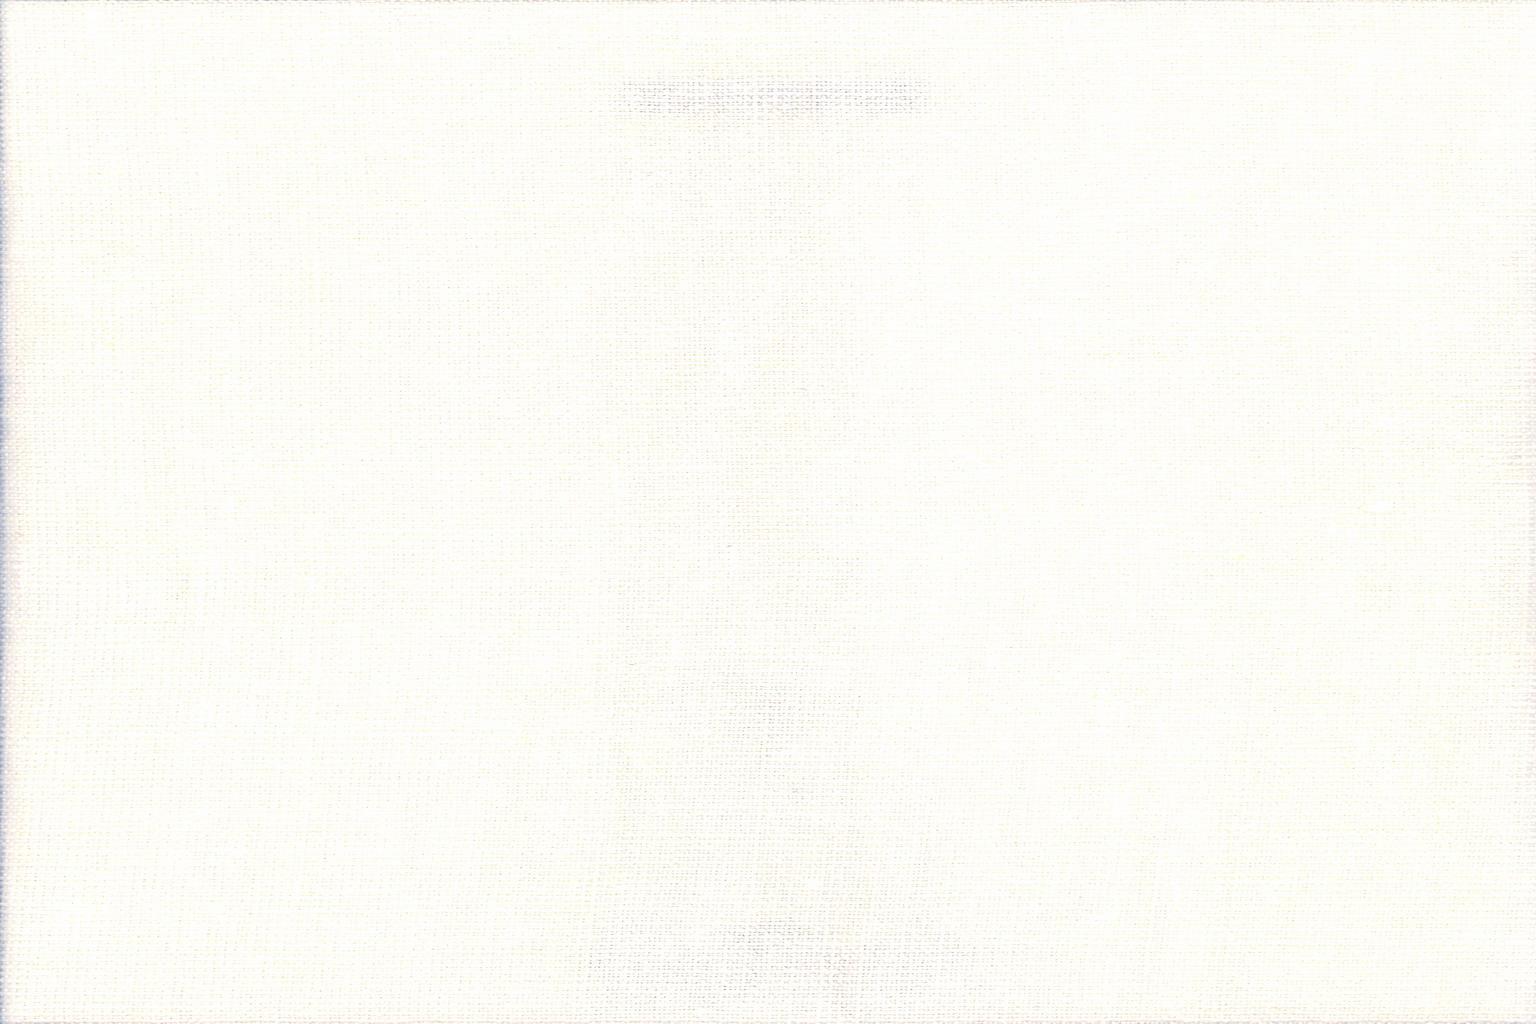 PIERRE White